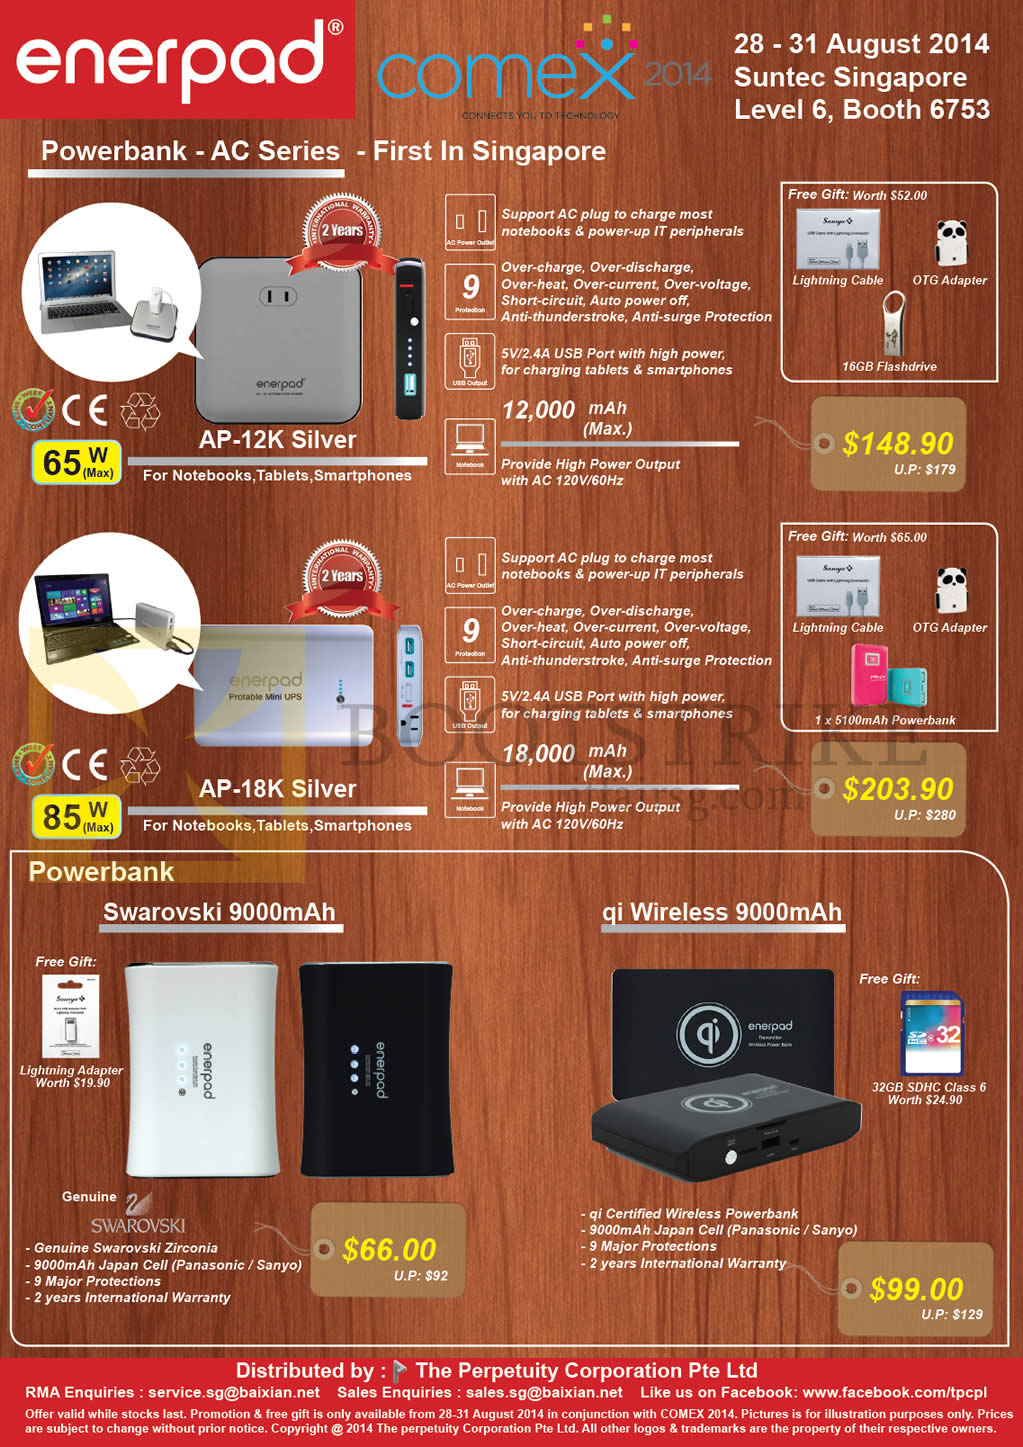 COMEX 2014 price list image brochure of The Perpetuity Enerpad Power Banks AC AP-12K Silver, 18K Silver, Swarovski 9000mAh, Qi Wireless 9000mAh